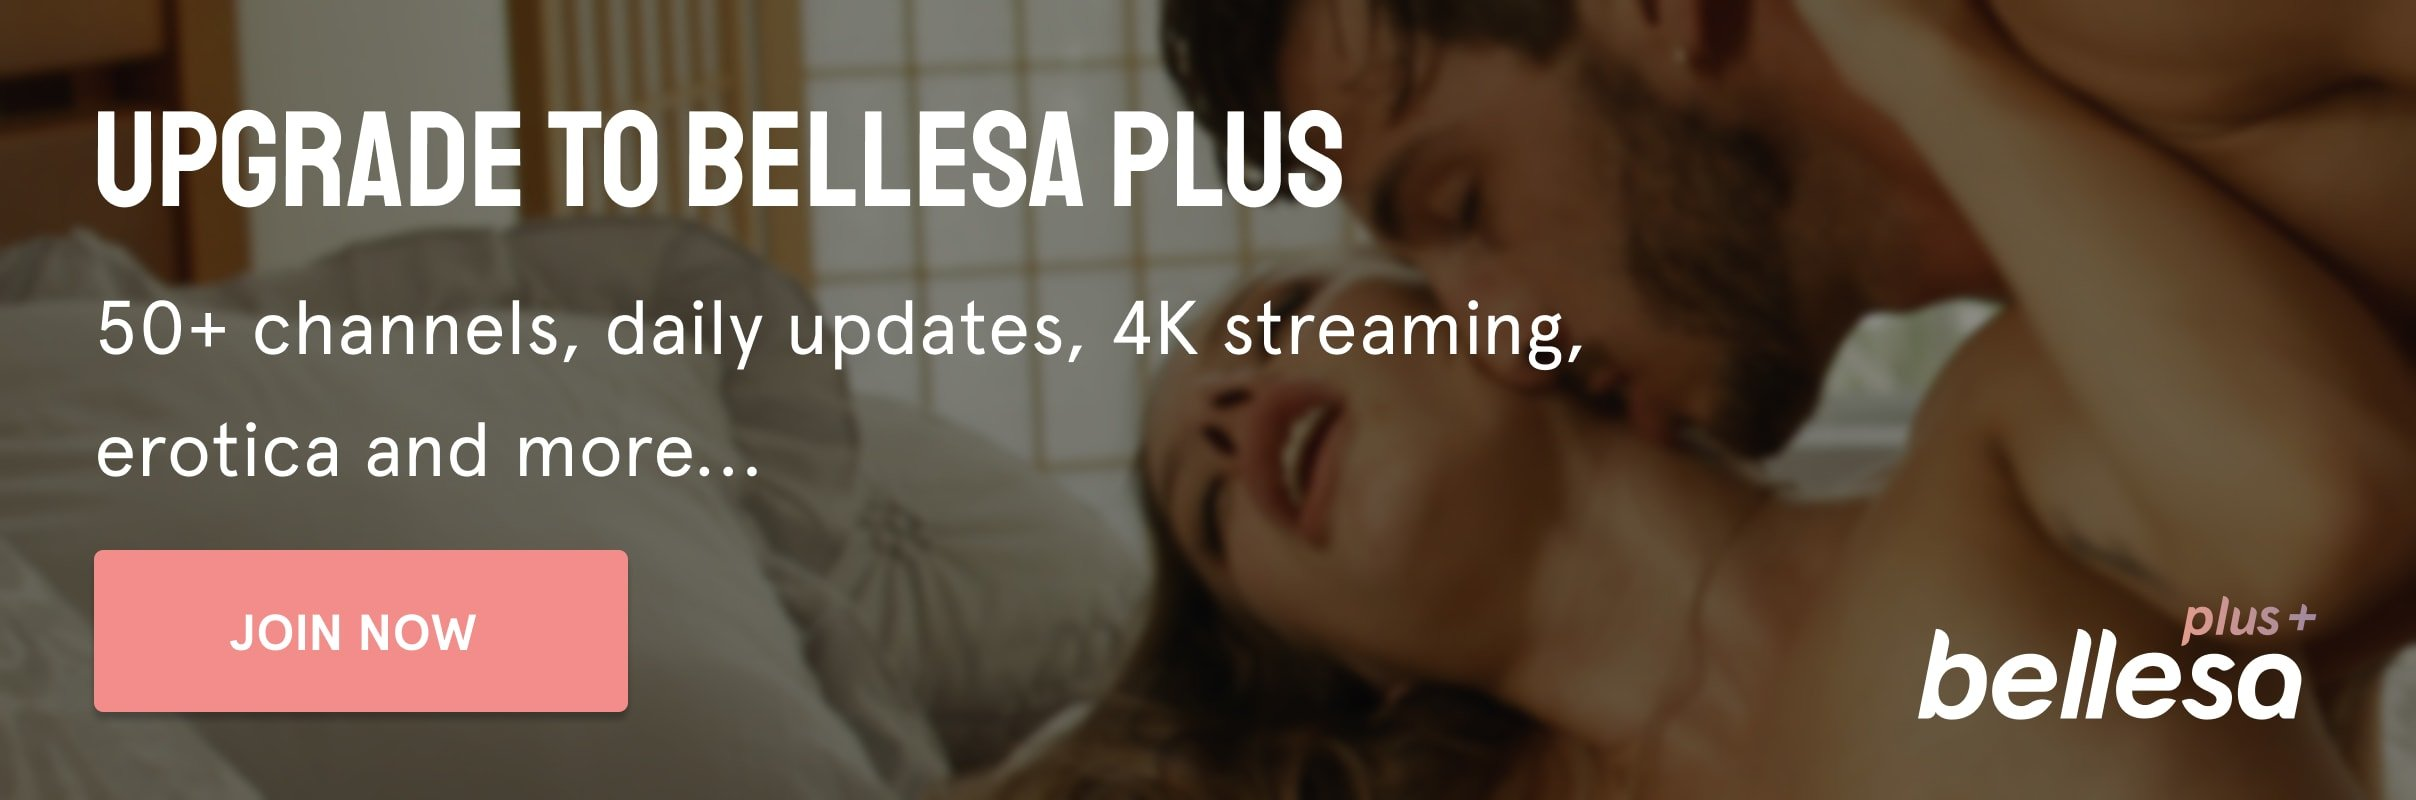 Bellesa Plus Search - Join Now